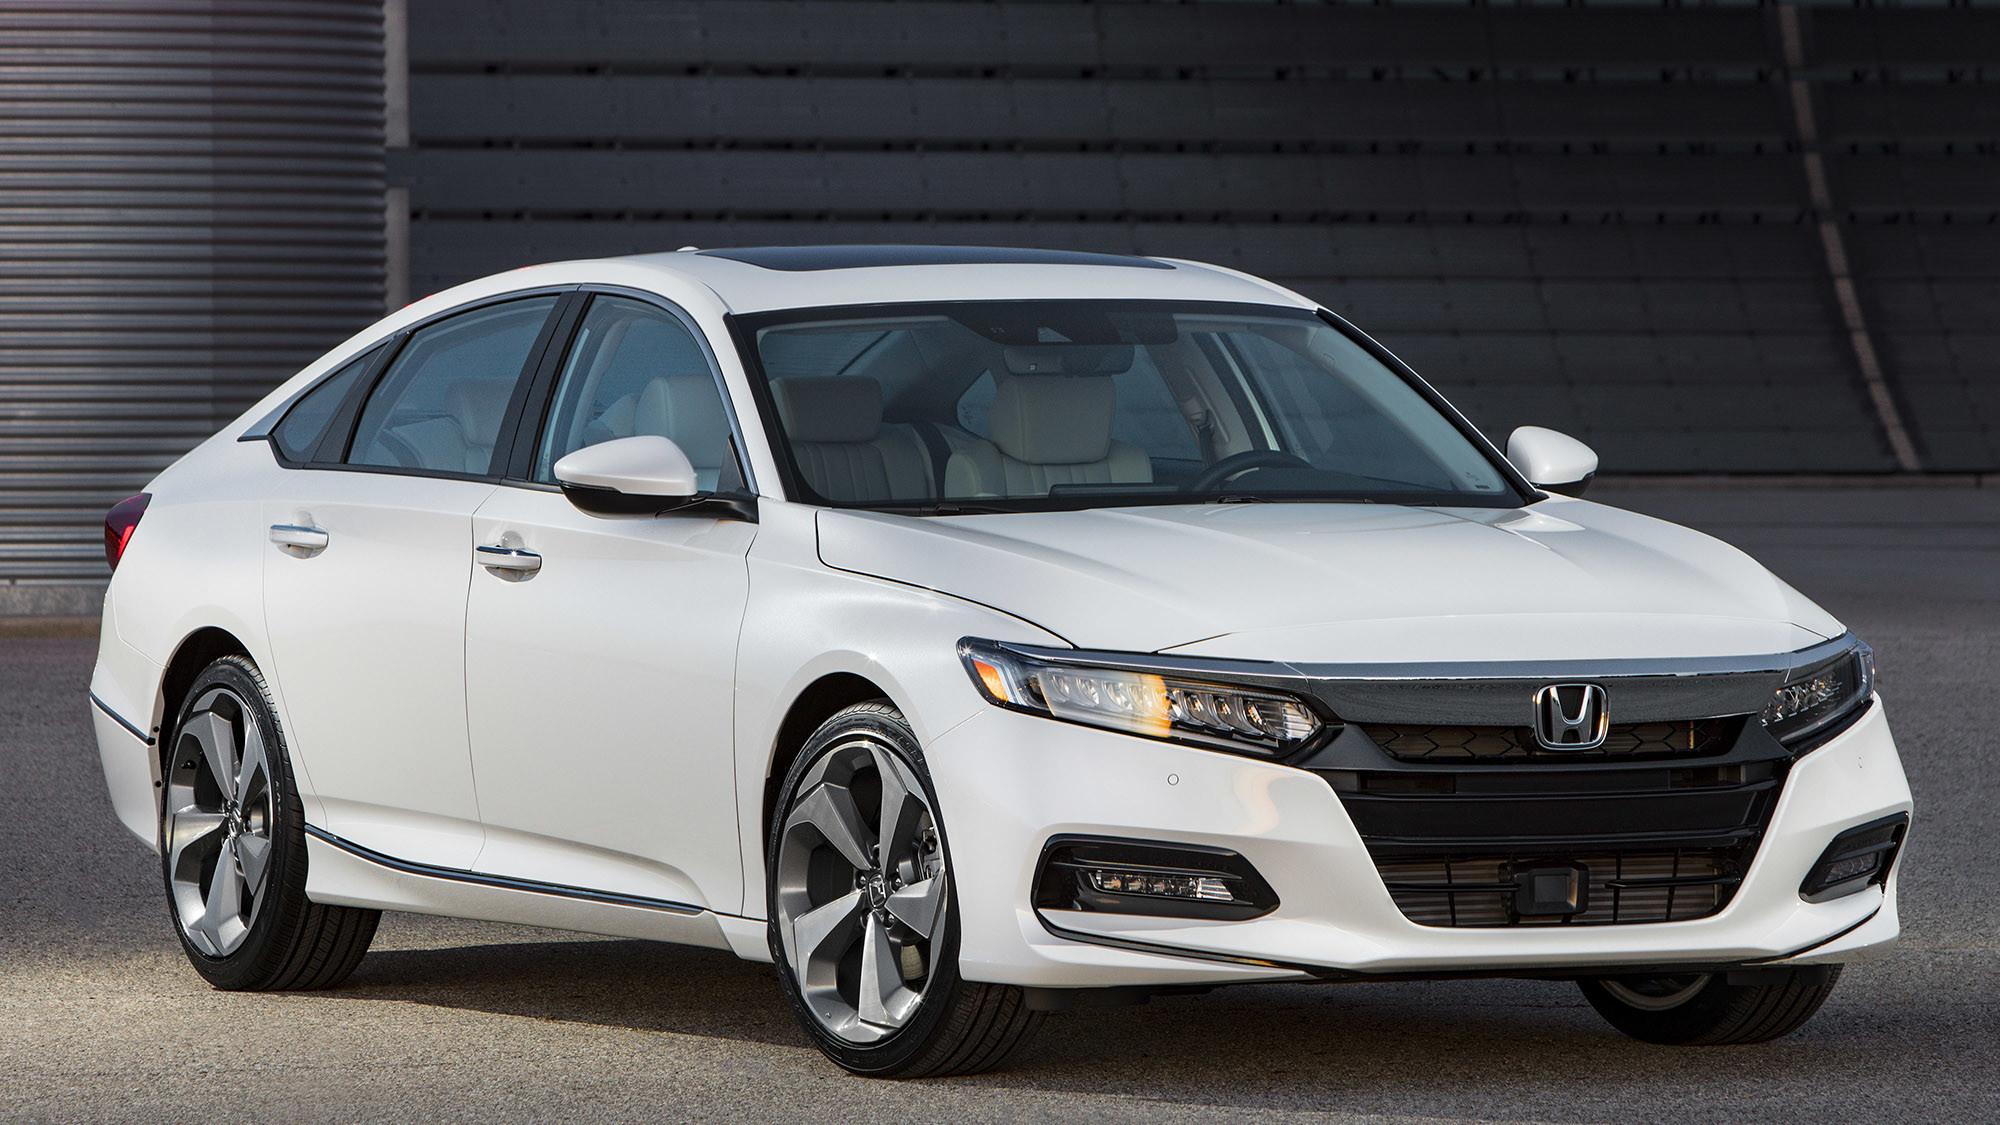 2018 Honda Accord - LA Times